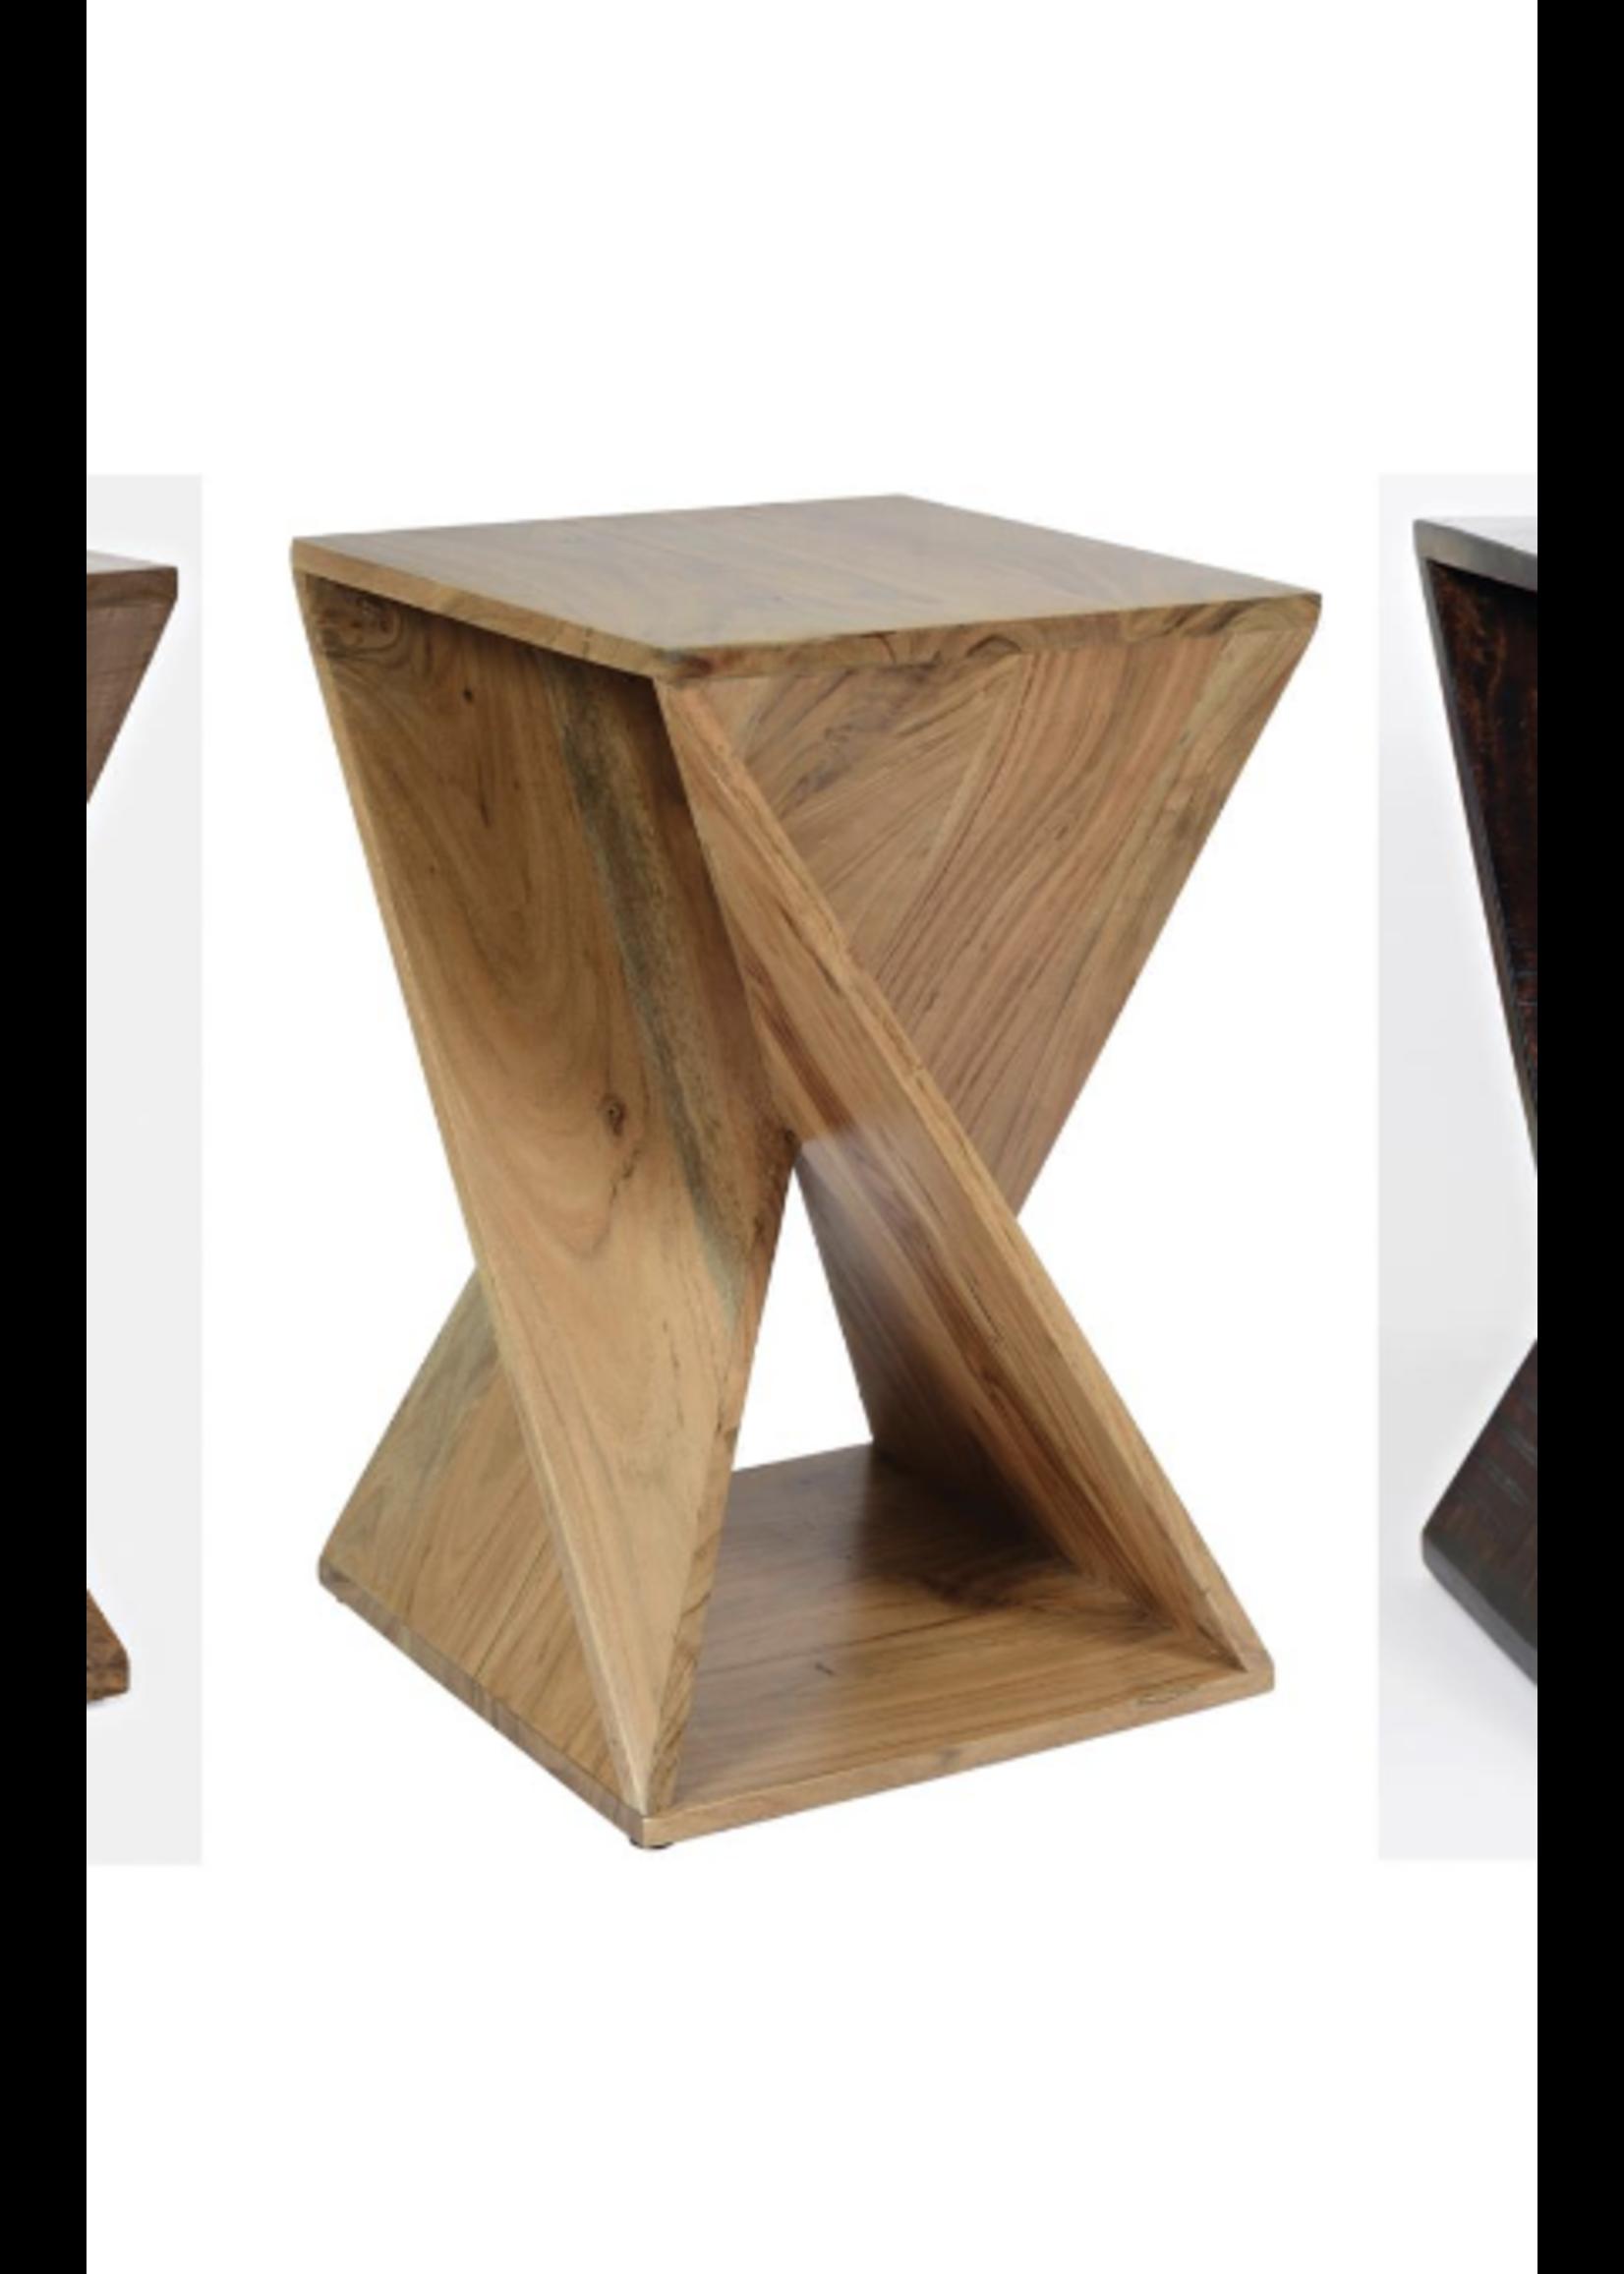 New Jasper Accent Table Natural JO 1730-5320